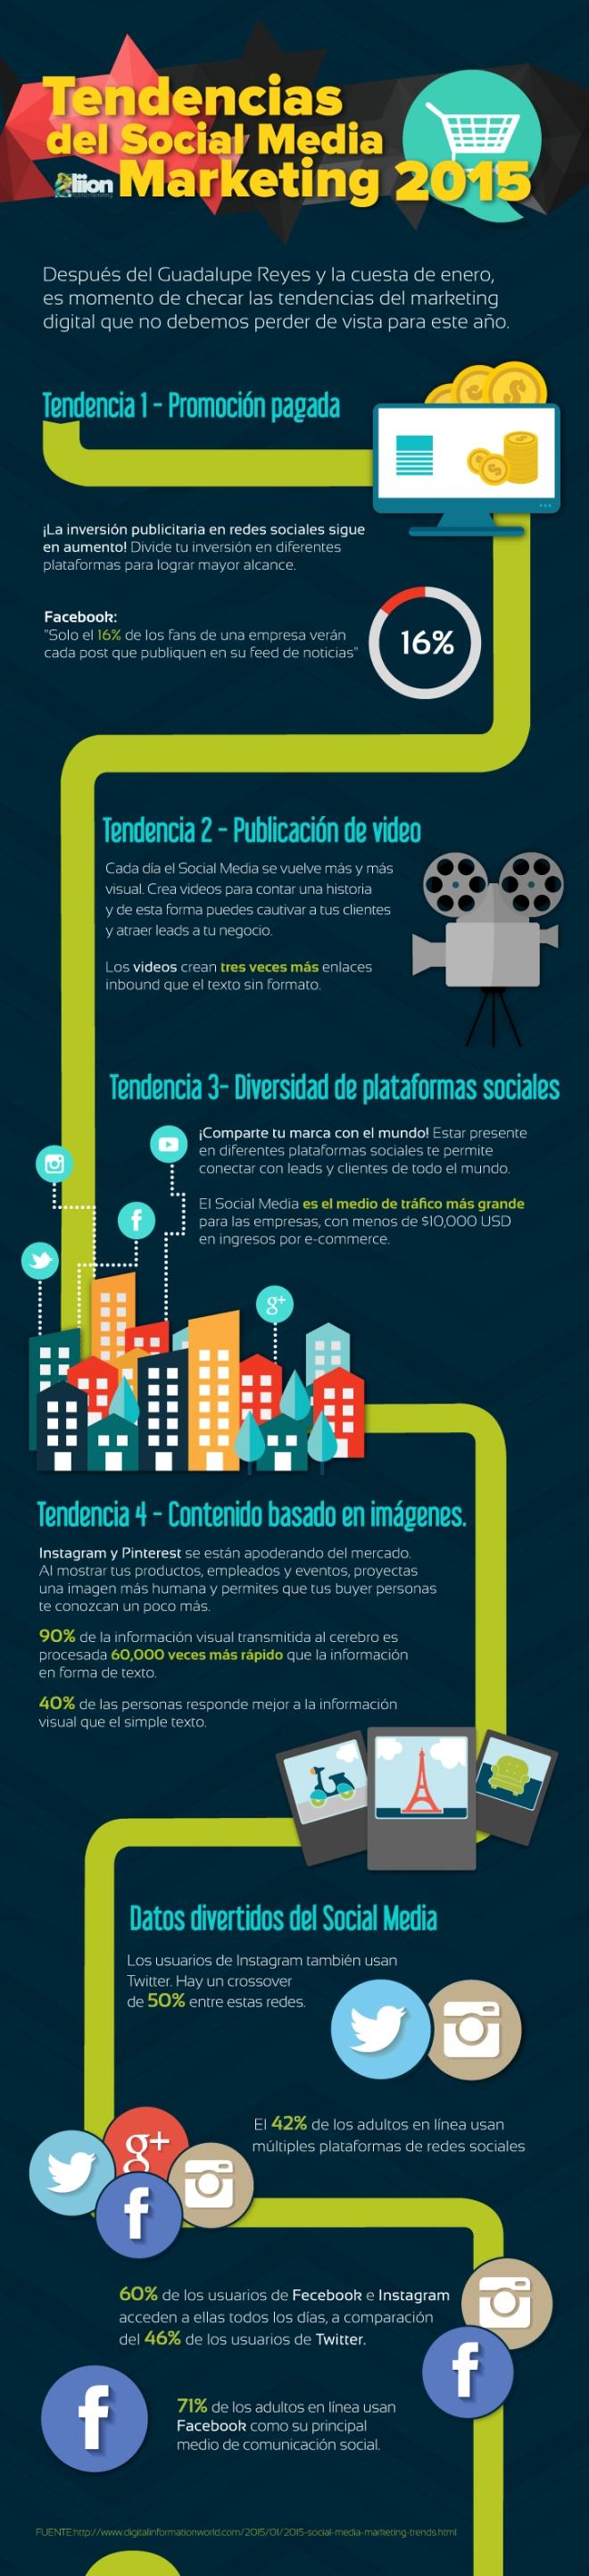 Tendencias Social Media Marketing 2015